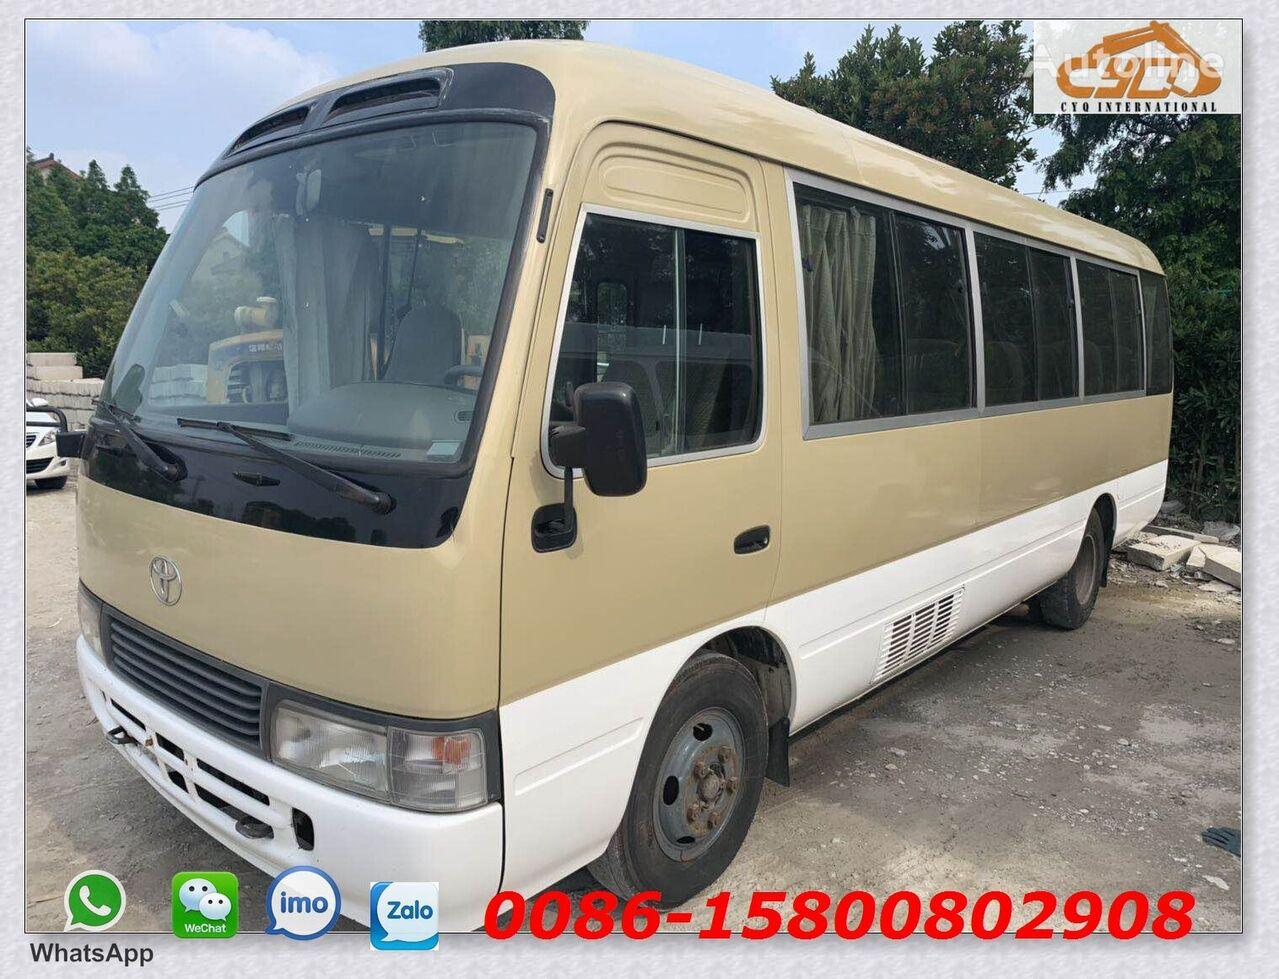 TOYOTA XZB50L-BRMNY interurban bus